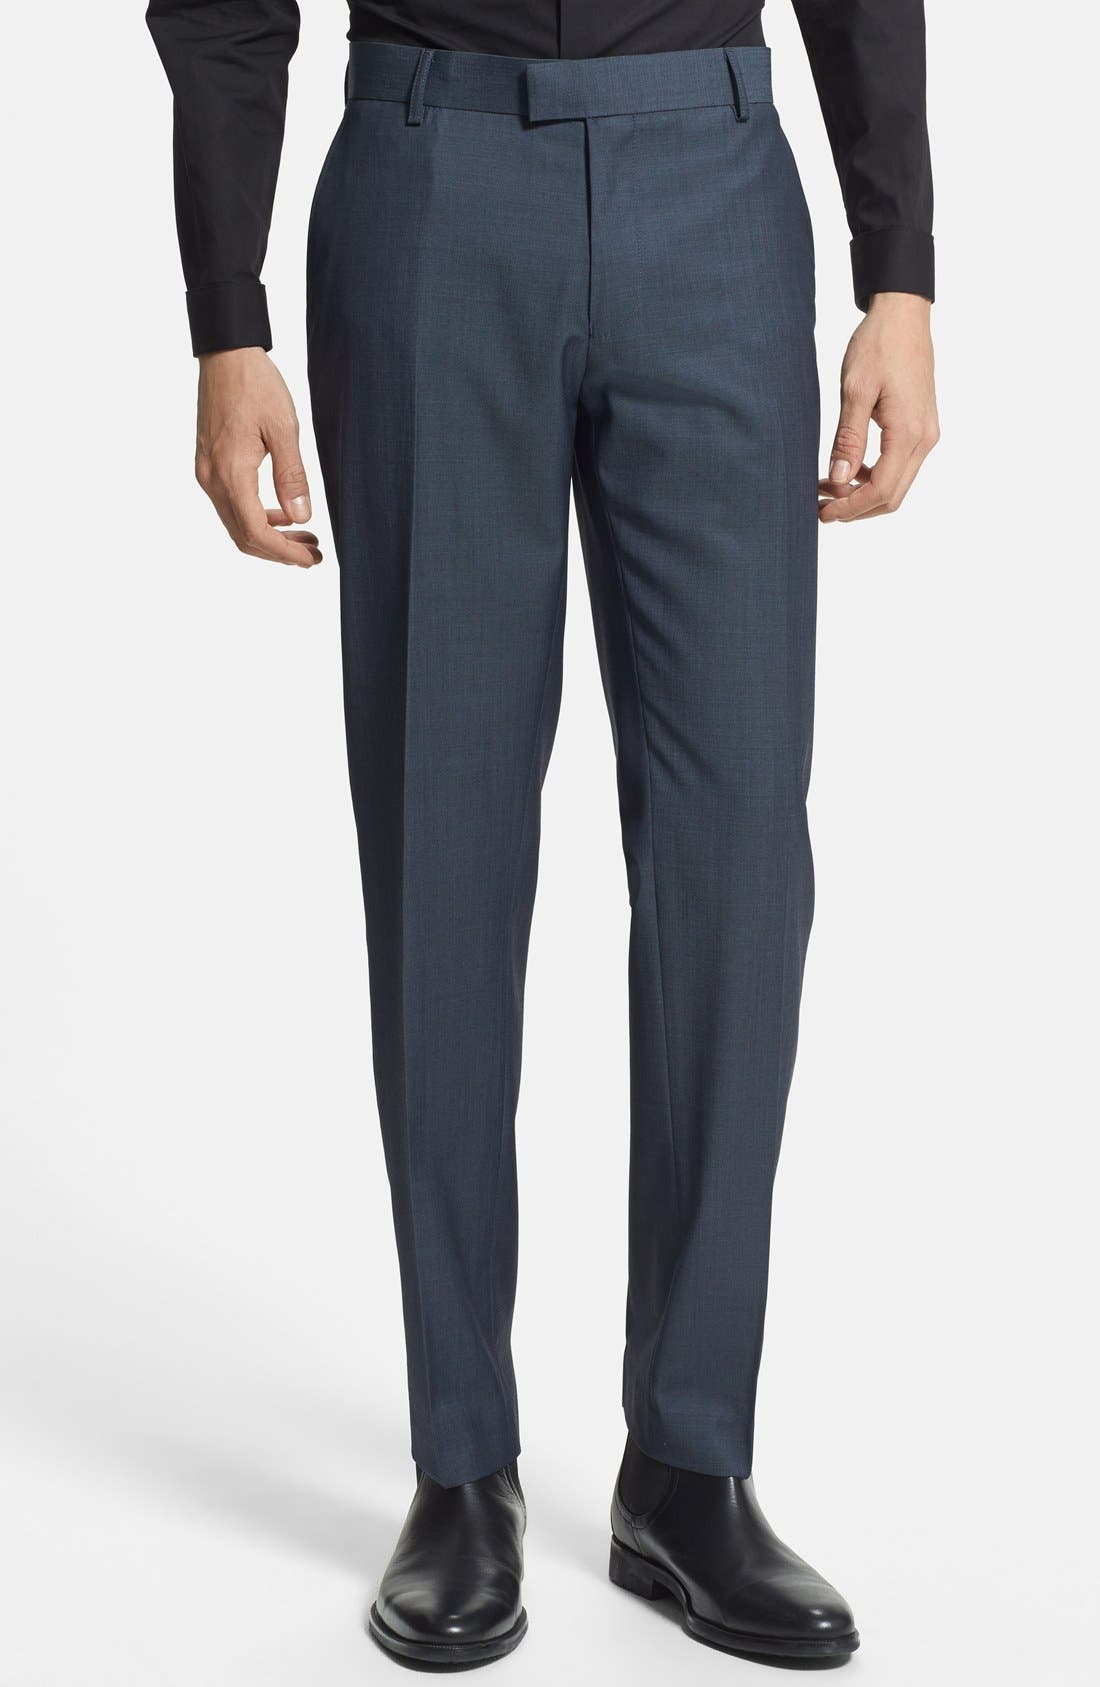 Alternate Image 1 Selected - Topman Skinny Fit Navy Suit Trousers